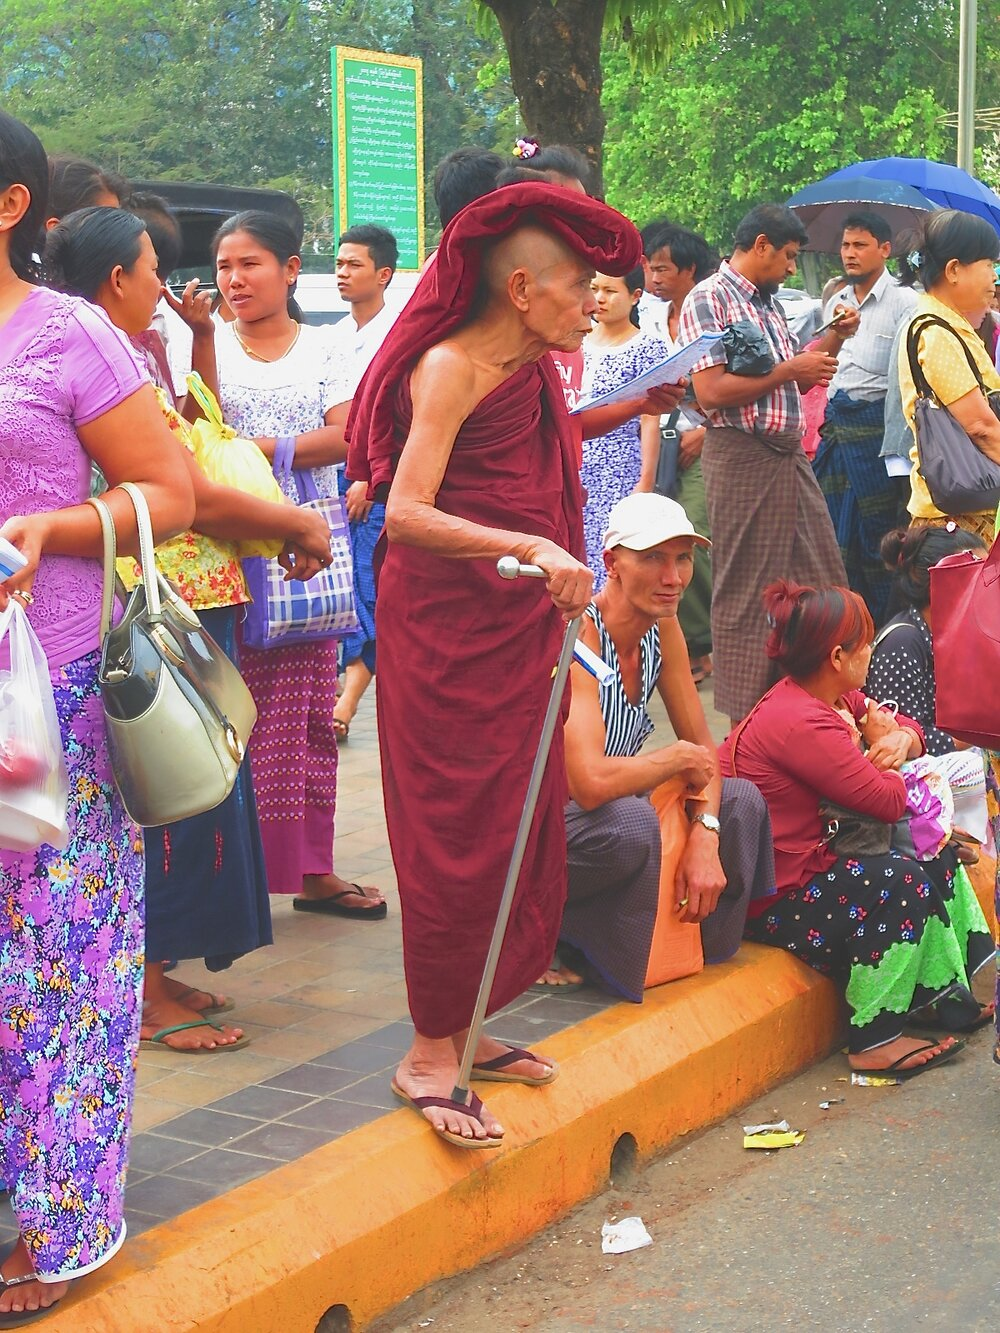 Street crossing, Yangon.